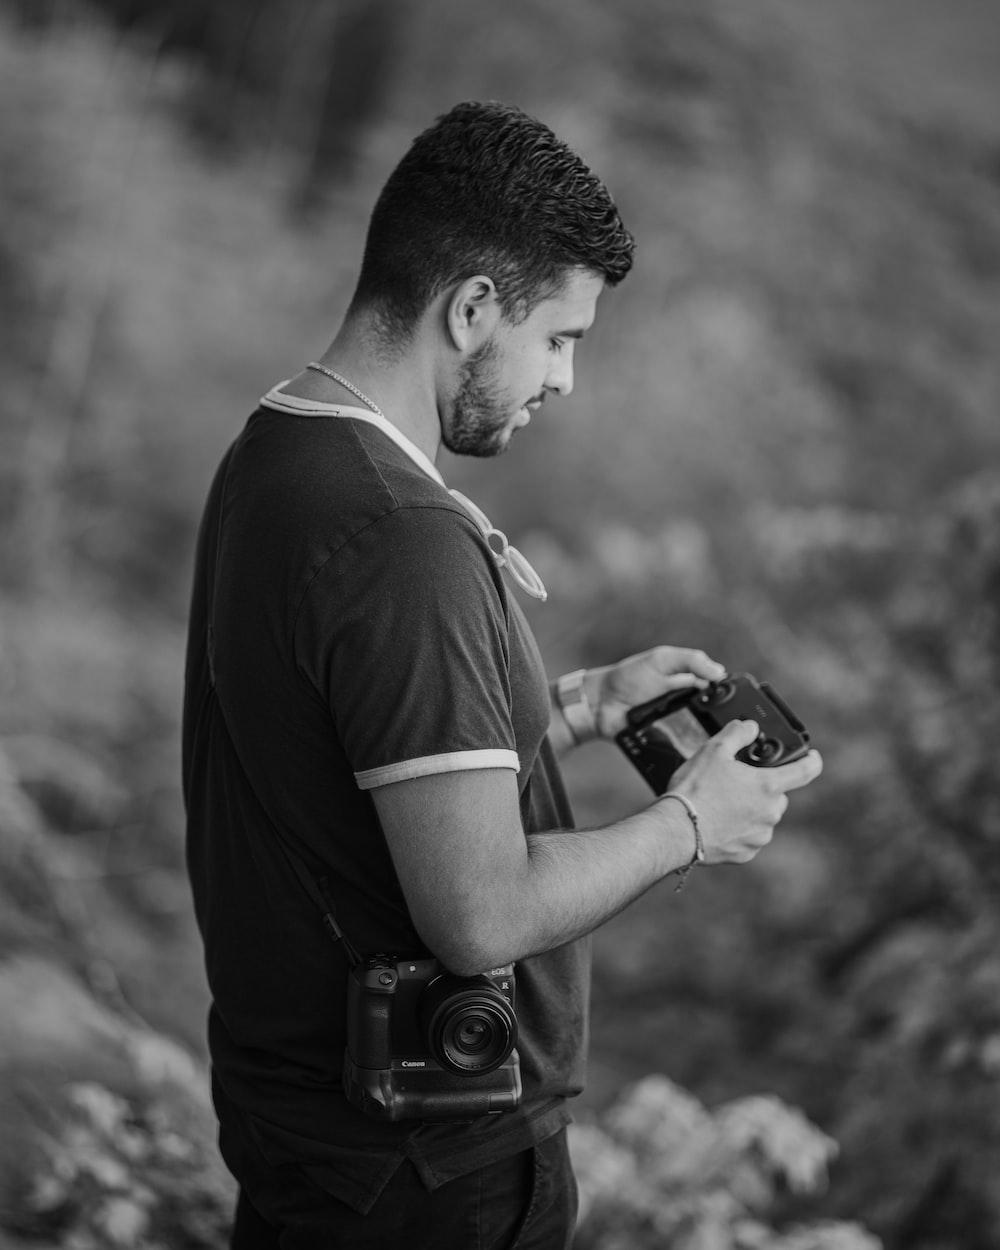 man in black t-shirt holding camera